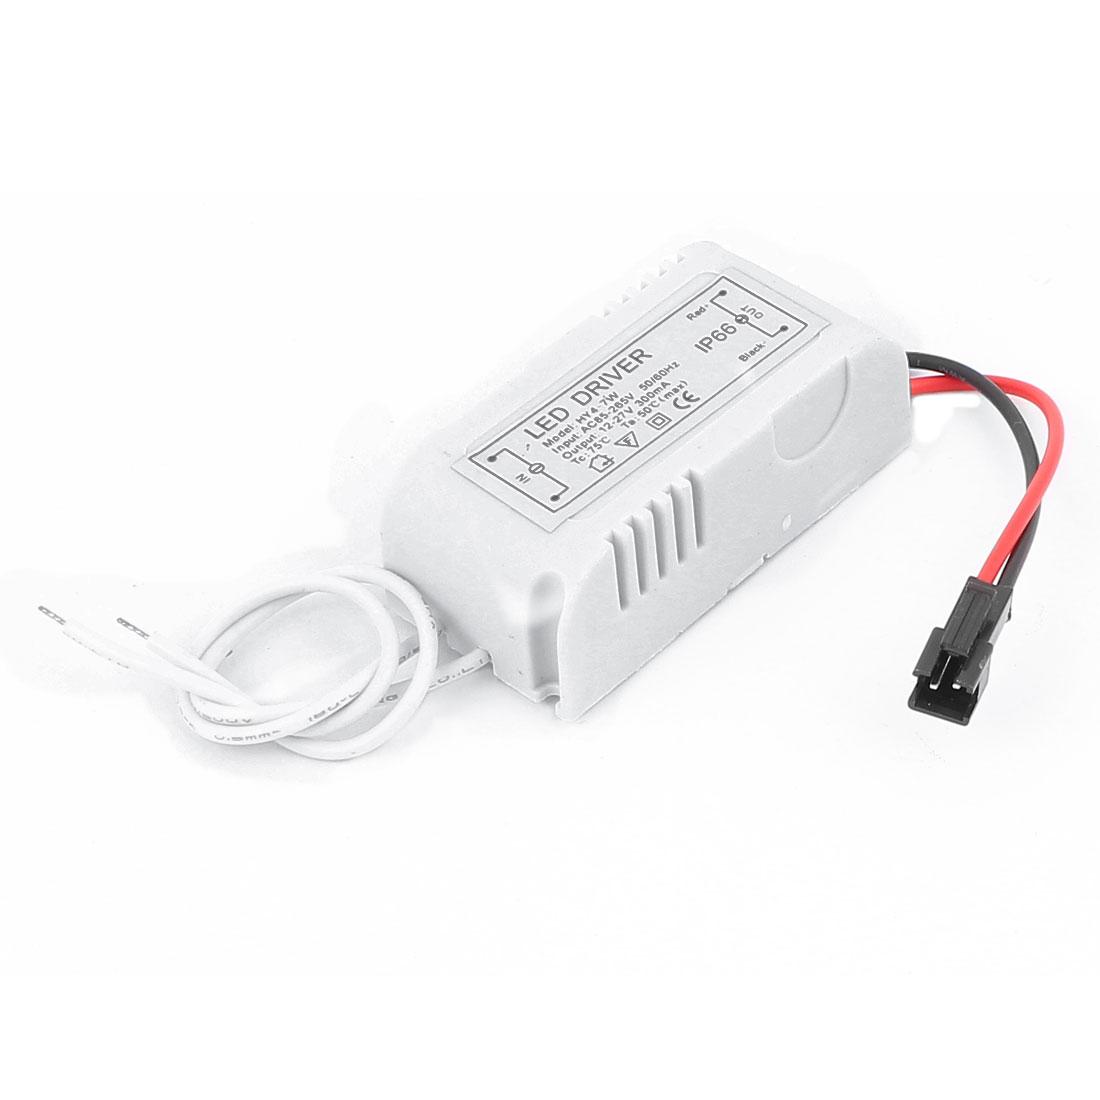 AC 85-265V Driver Power Supply Adapter White for 4-7 1W LED Strip Light Lamp